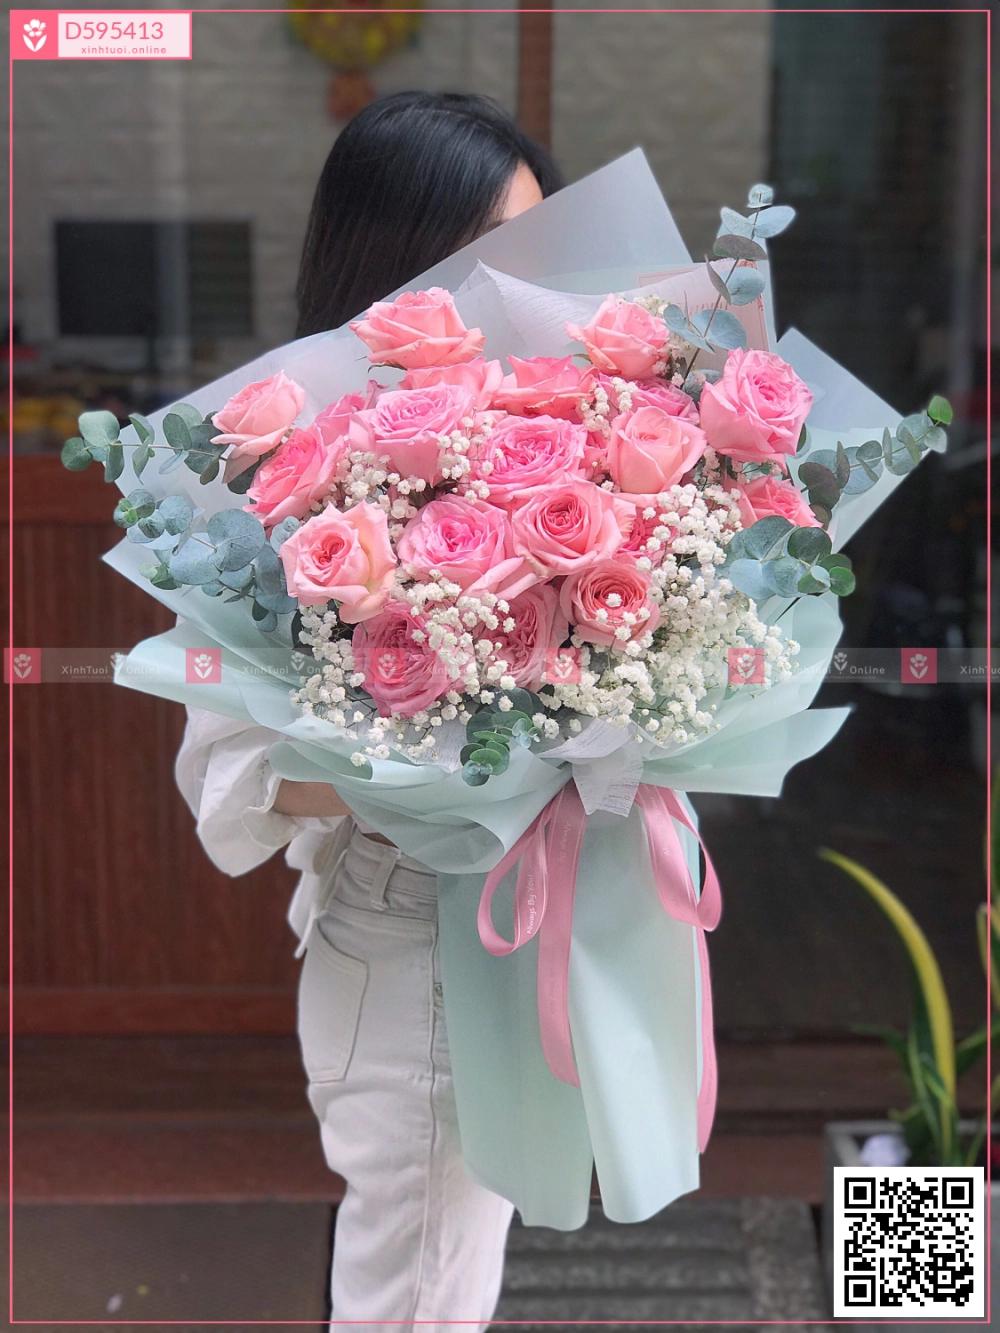 Princess ; International Women's Day ; Pretty ; Girls ; Baby ; Mommy - D595413 - xinhtuoi.online